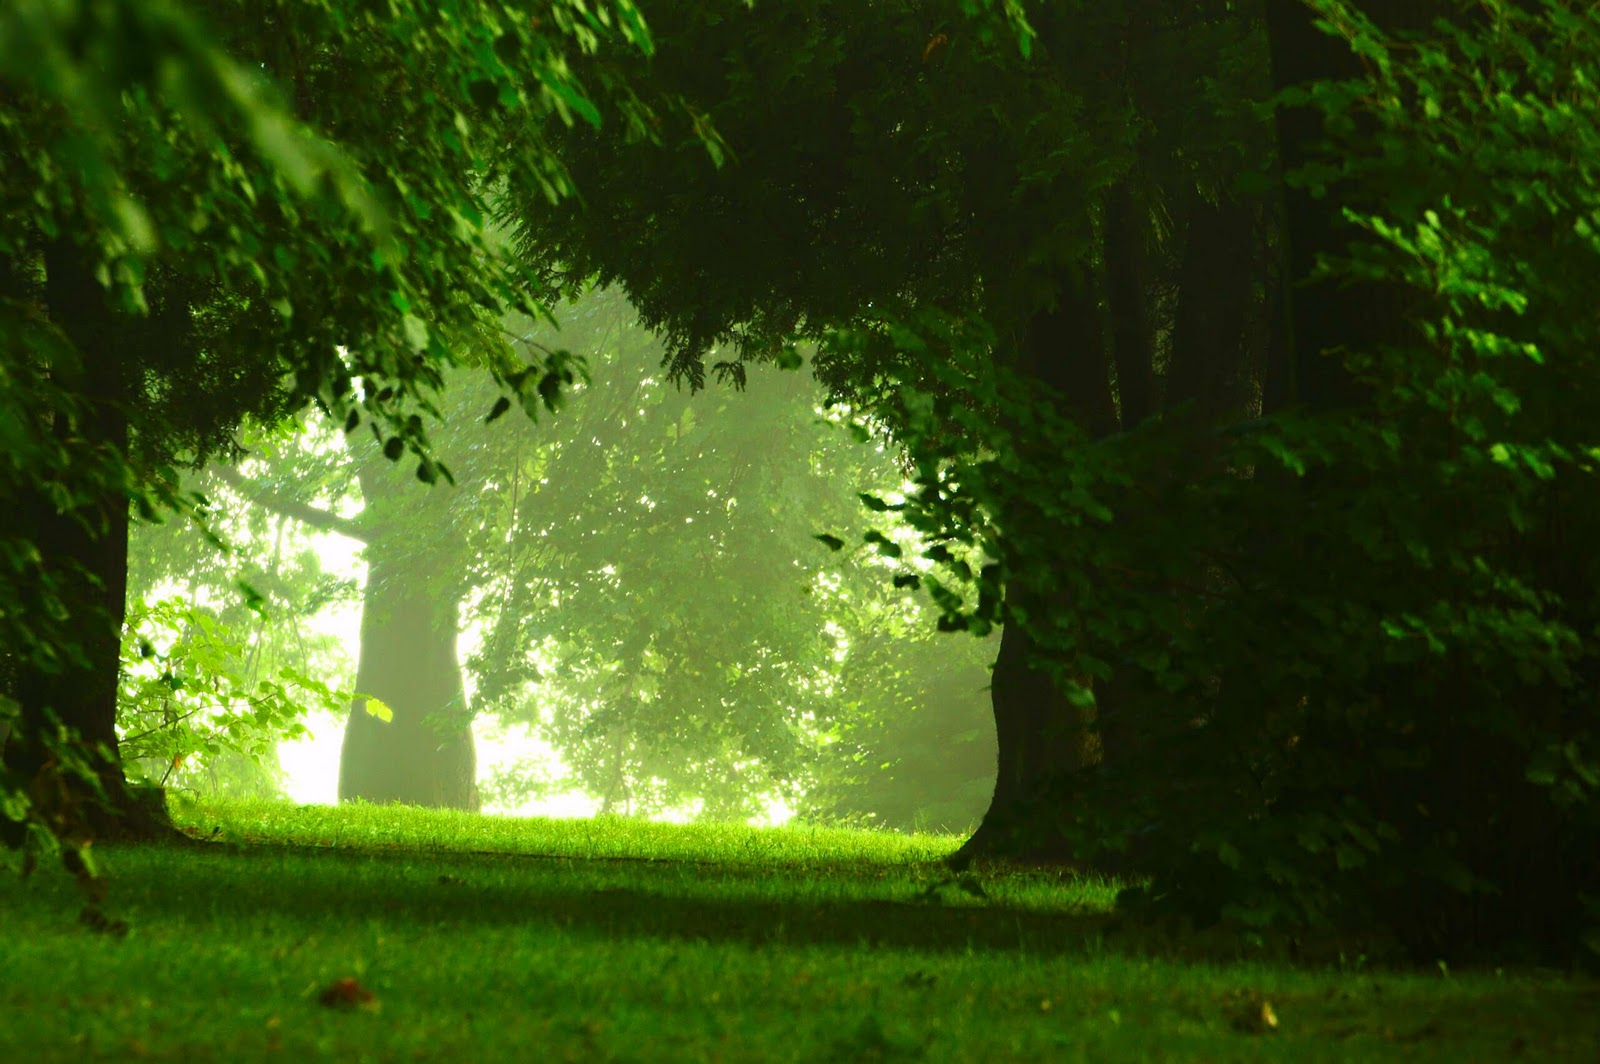 http://3.bp.blogspot.com/-cLKTHMHLI9k/TnXXLCbKqII/AAAAAAAAAo0/a09eCAfcHhg/s1600/Woodland+by+Dariusz+Duma.jpg